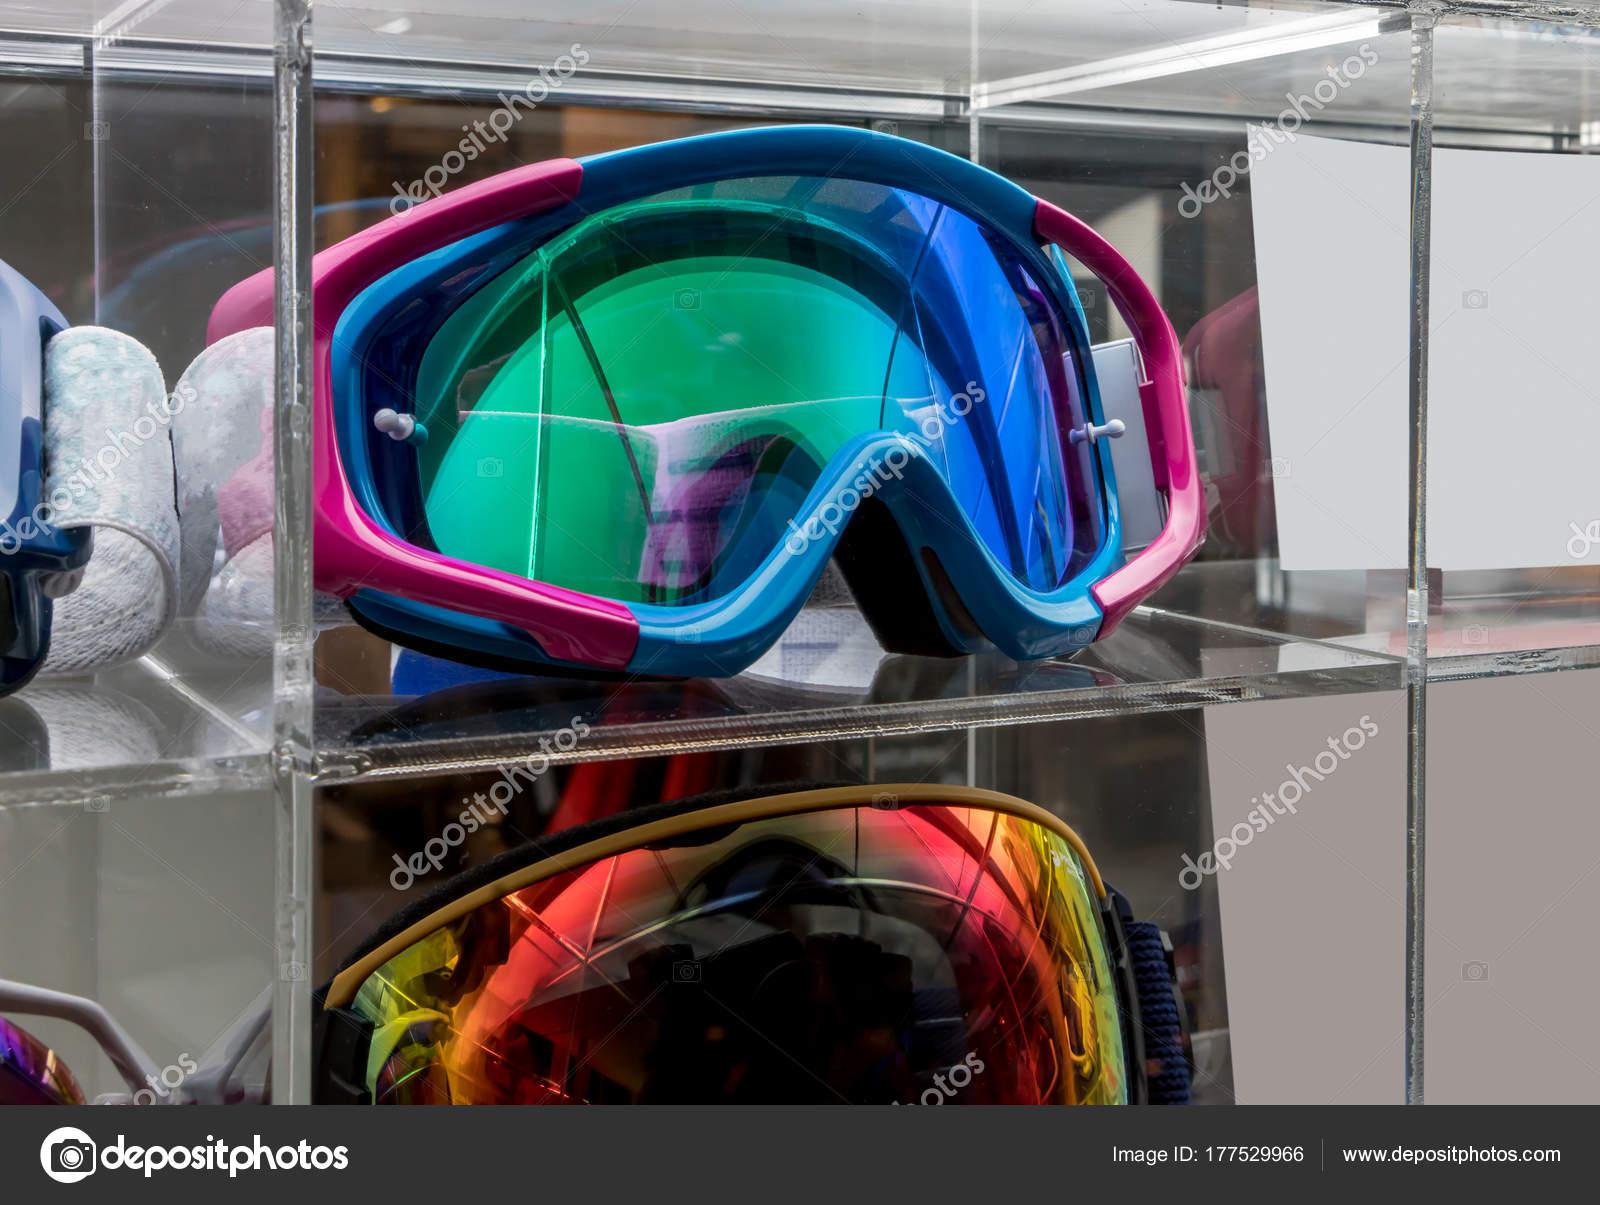 Masques De Motocross Acrylique Exposee Au Magasin